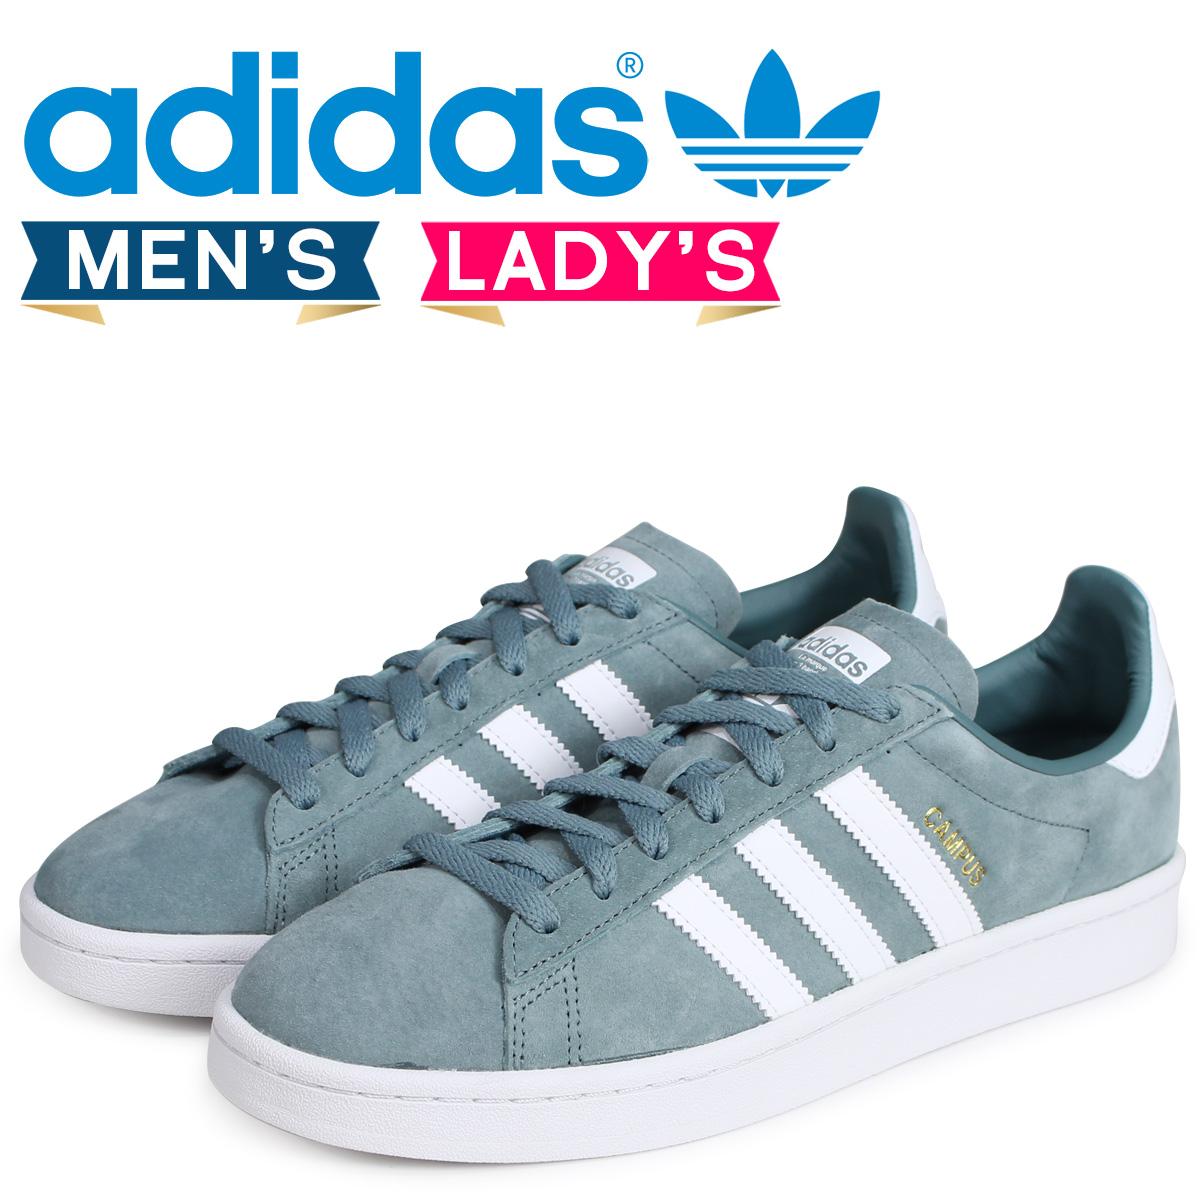 adidas Originals campus Adidas originals sneakers CAMPUS men gap Dis B37822 green